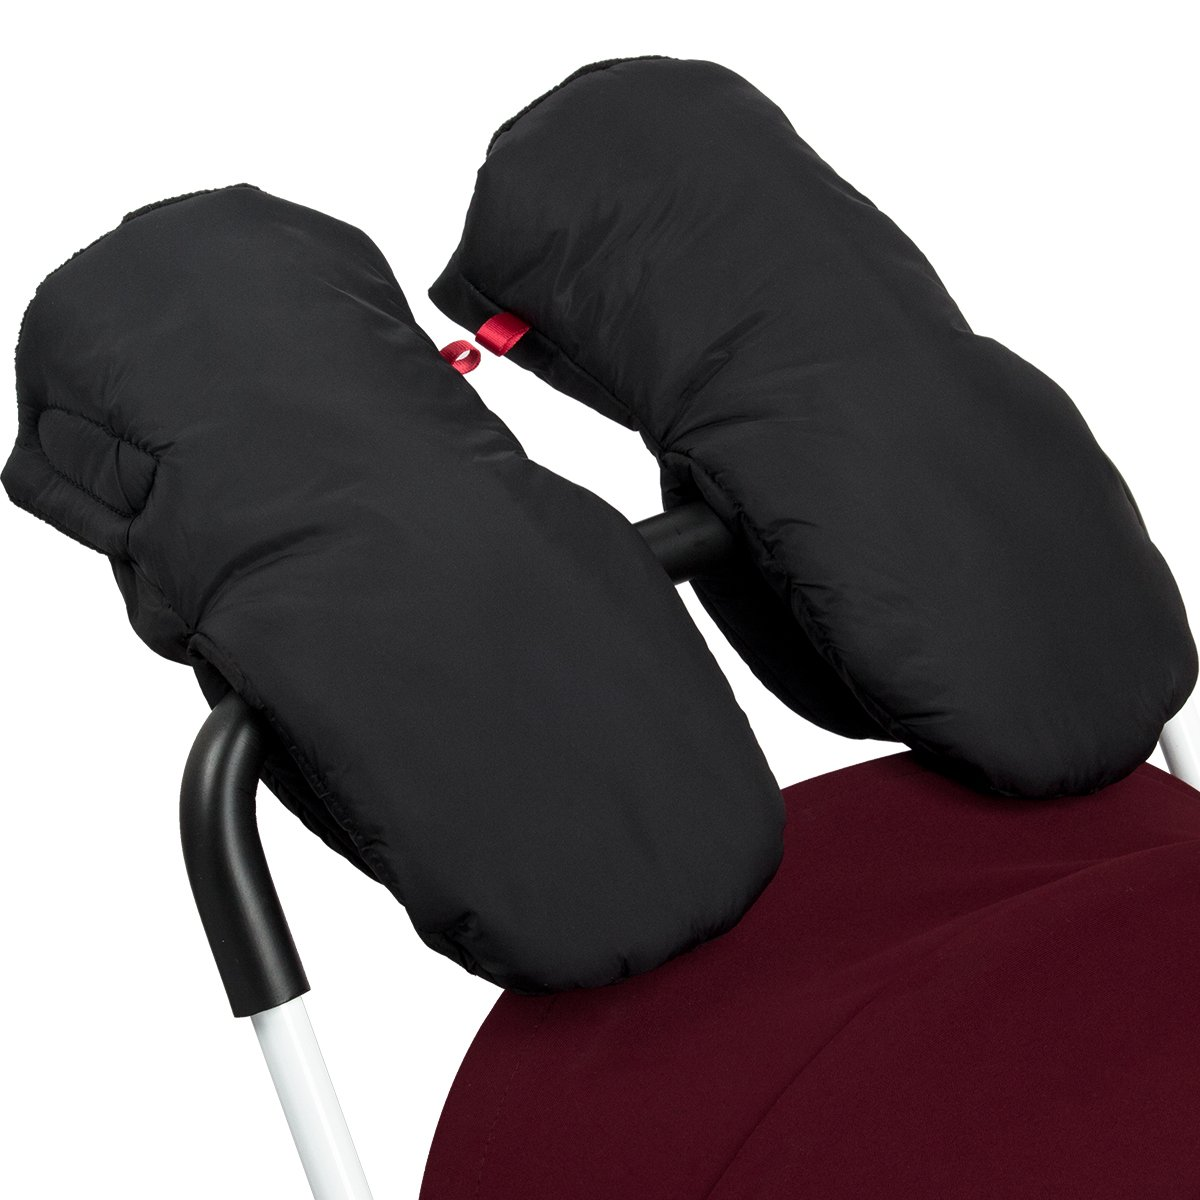 Biubee Stroller Hand Muff Winter Warm Pram Mitten Gloves for Parents and Caregivers Waterproof Anti-Freeze Black